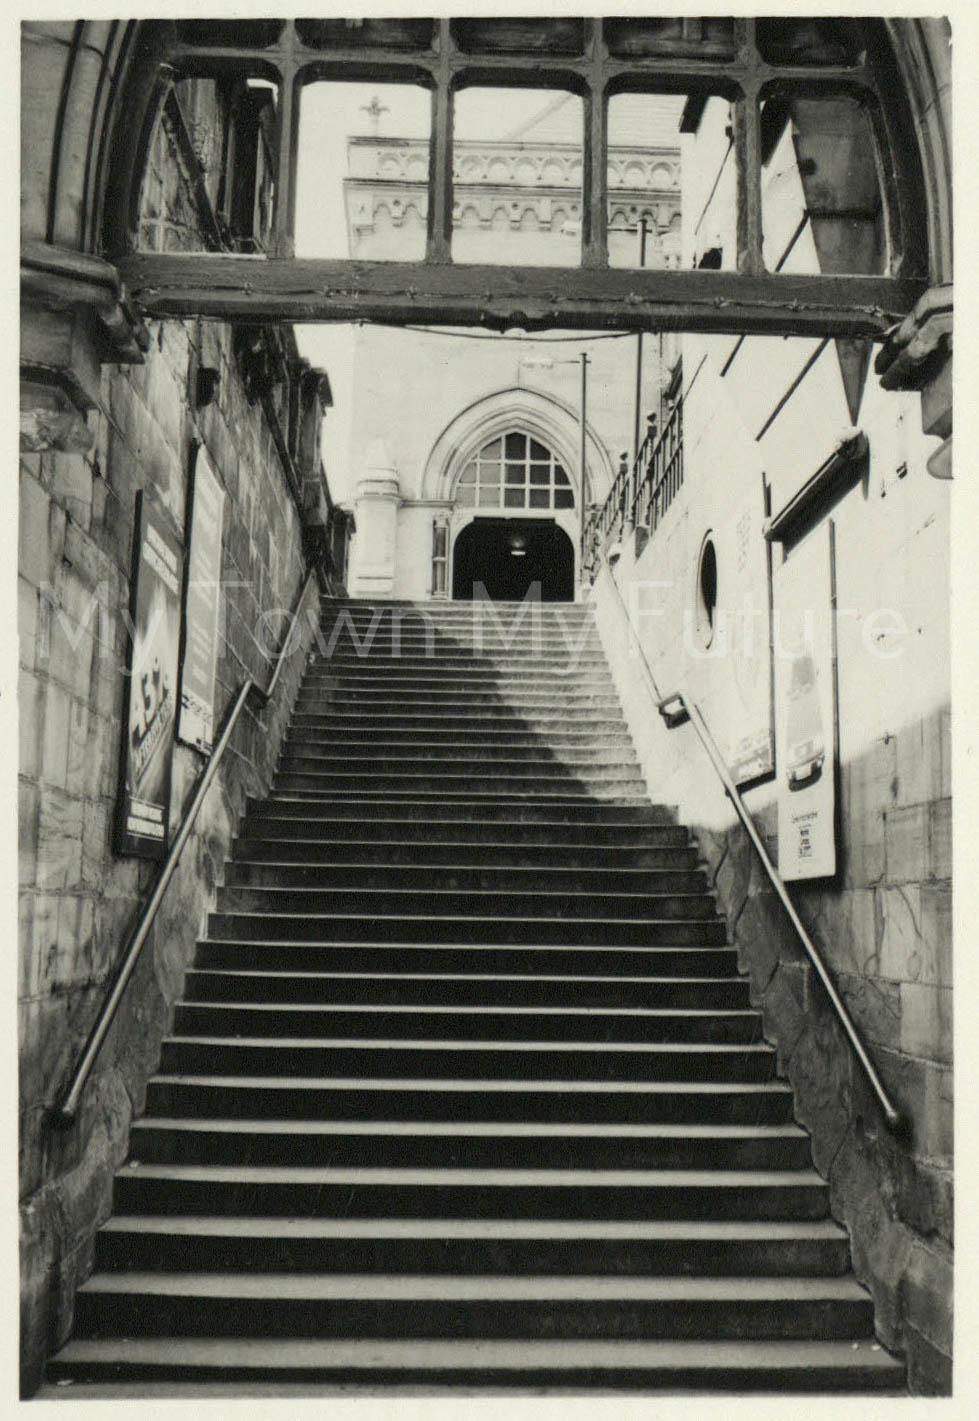 Middlesbrough Railway Station